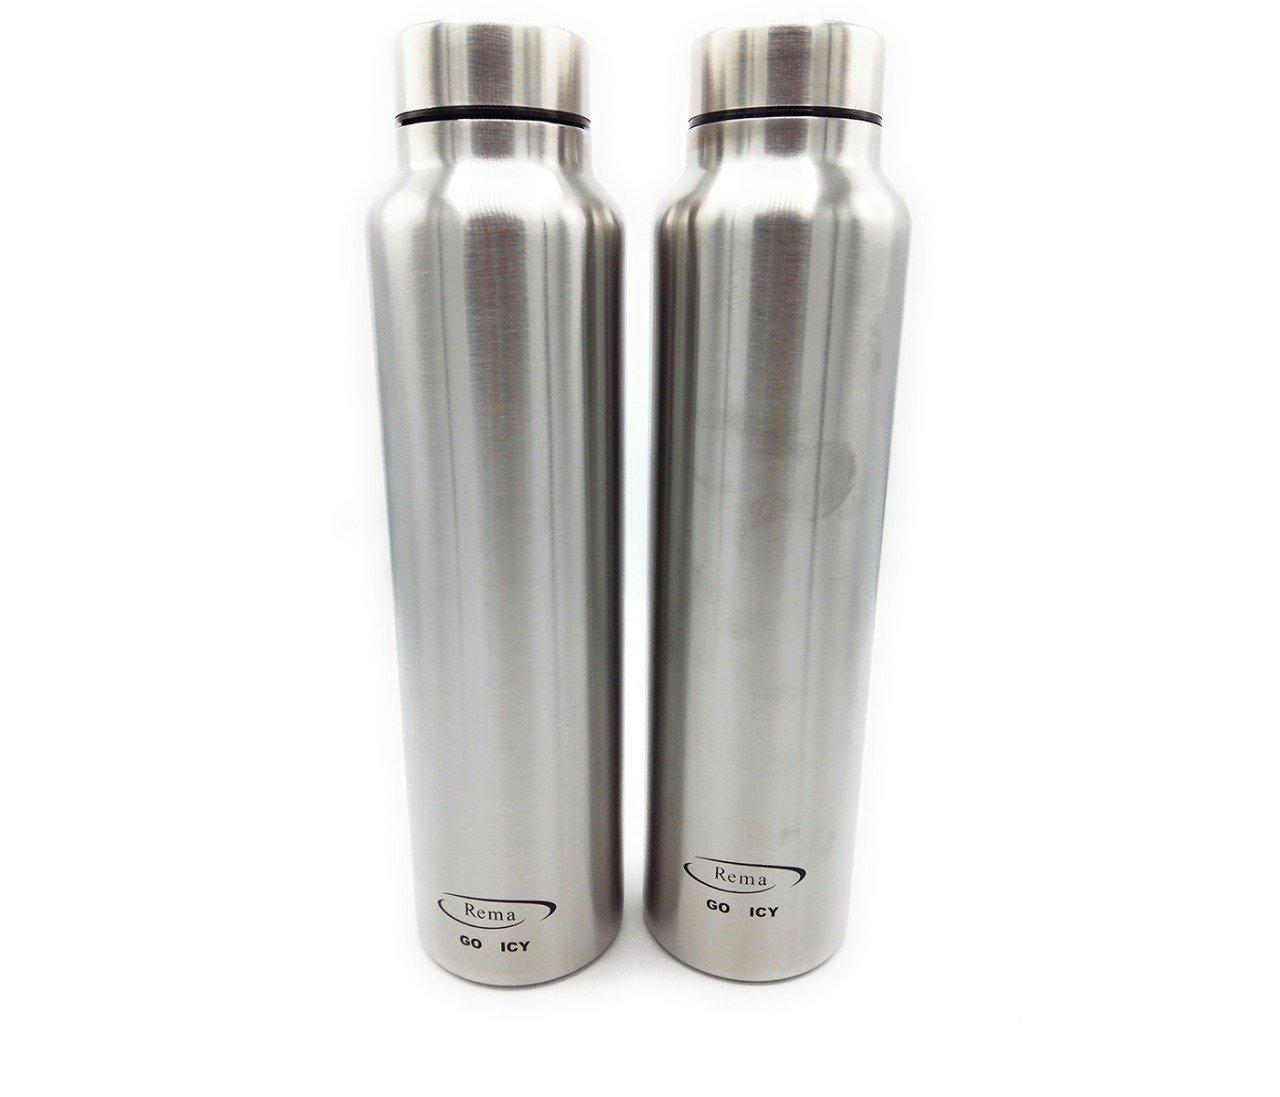 5ffc9c4e9b4 Ivarian Rema Stainless Steel Bottle